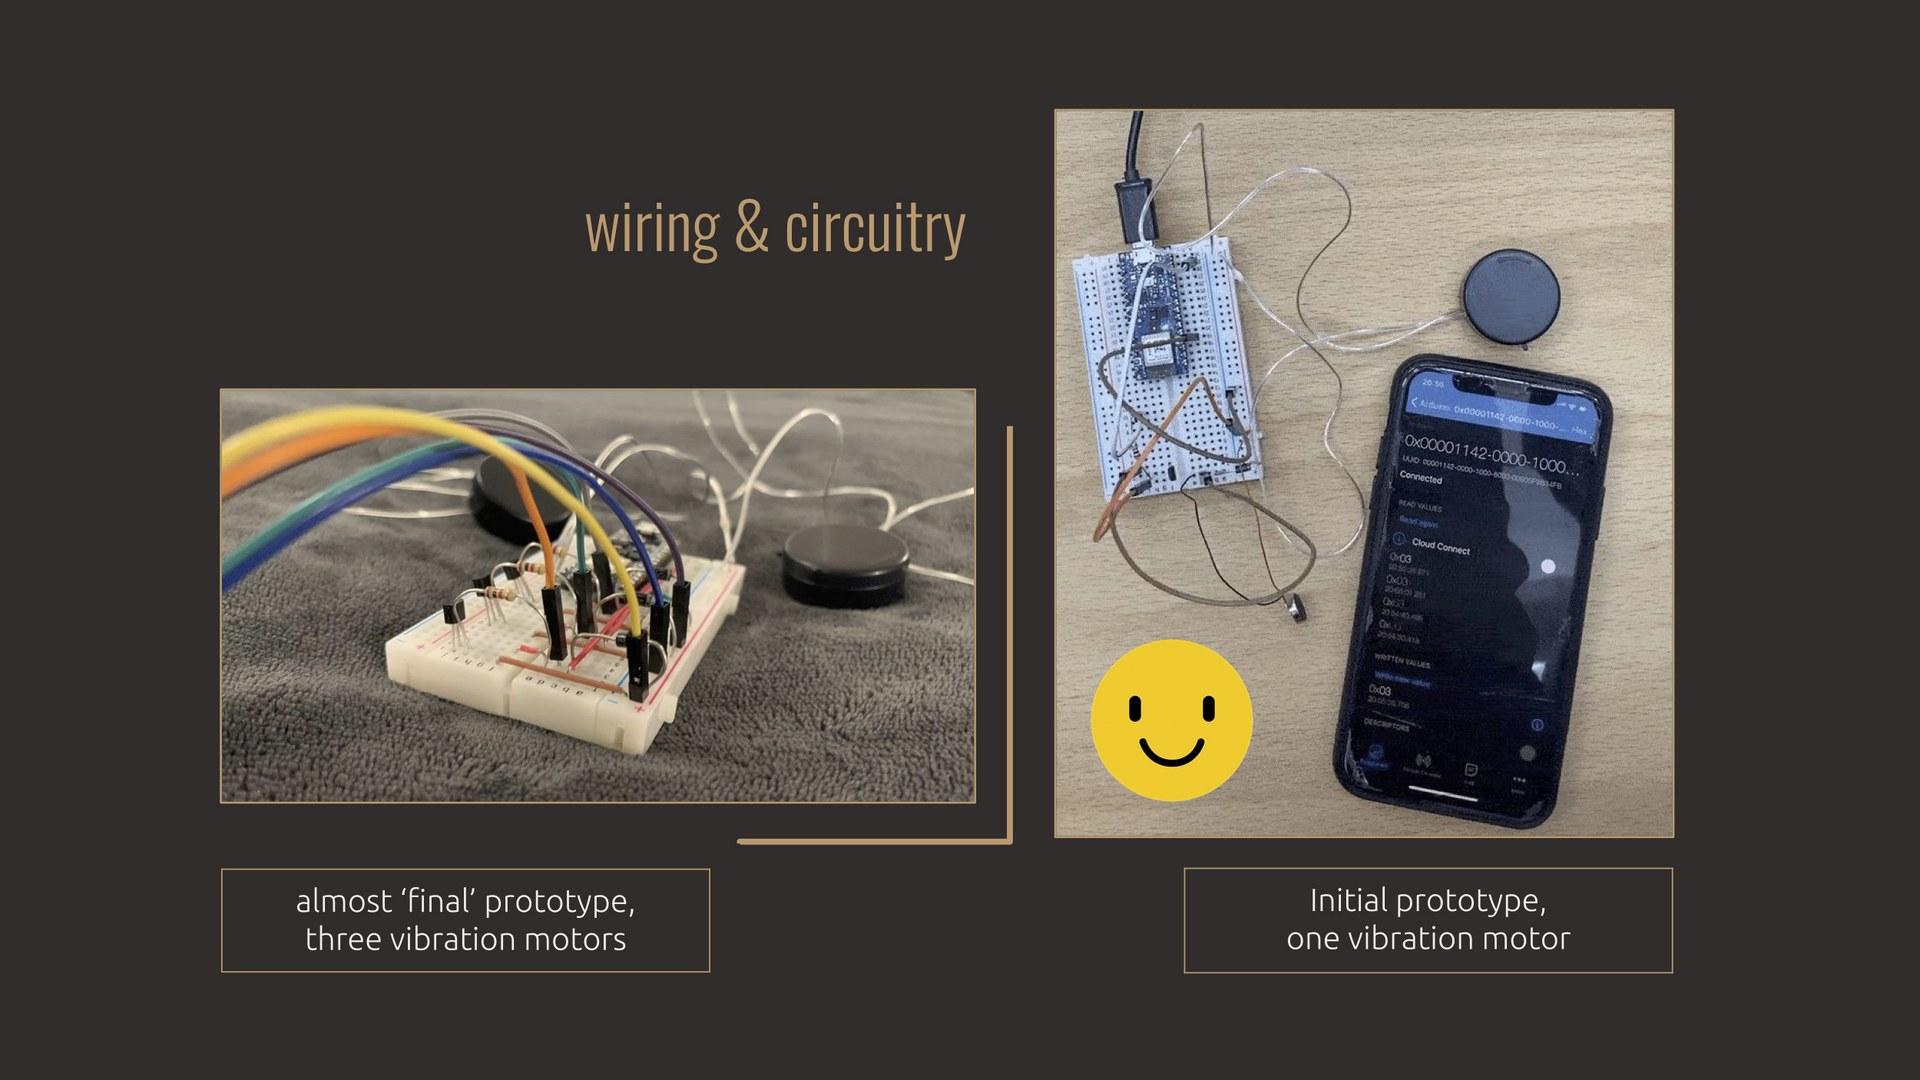 Wiring & Circuitry